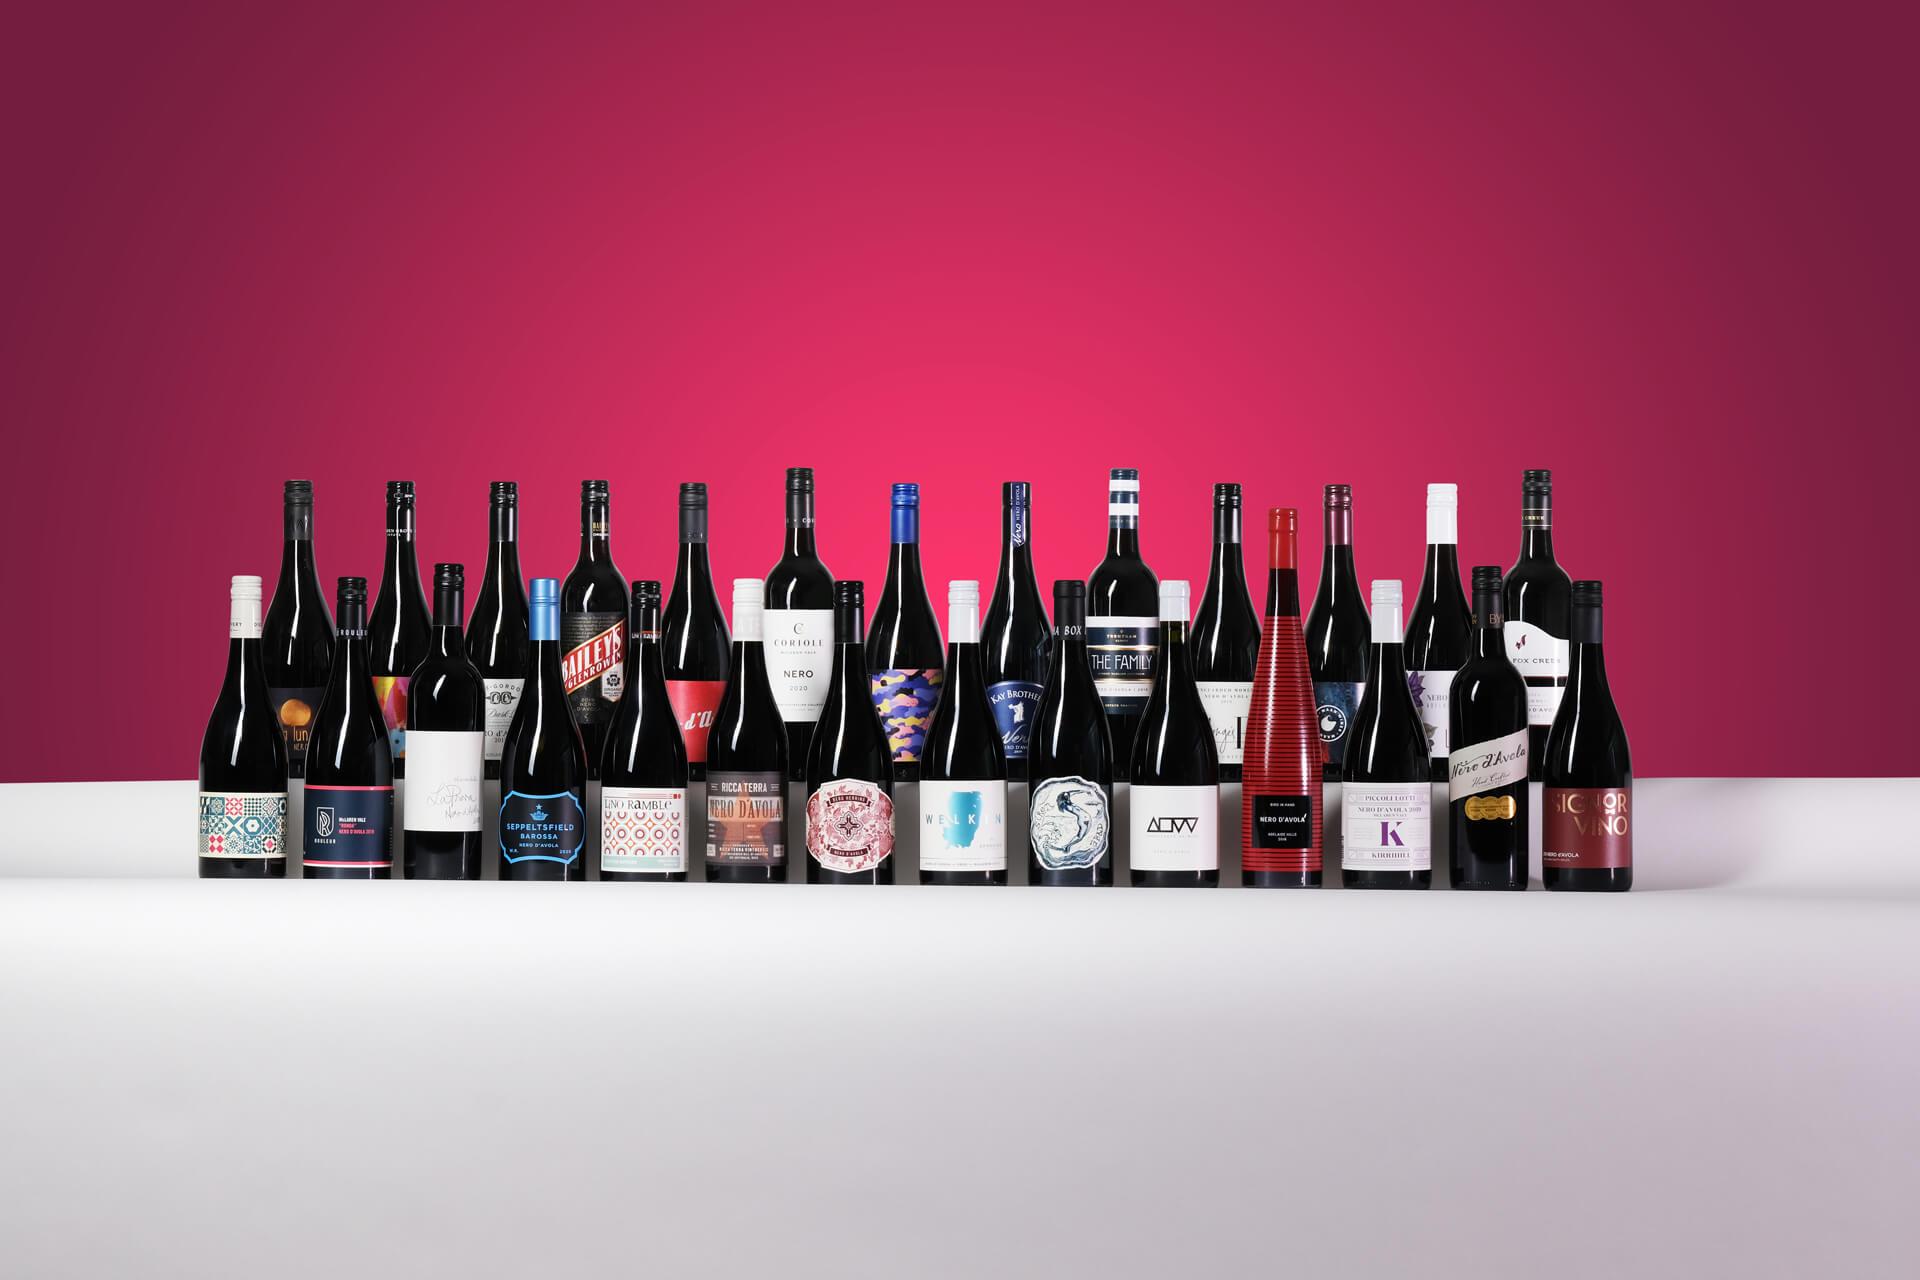 Featured grape varietal: Nero - The Black Grape of Avola